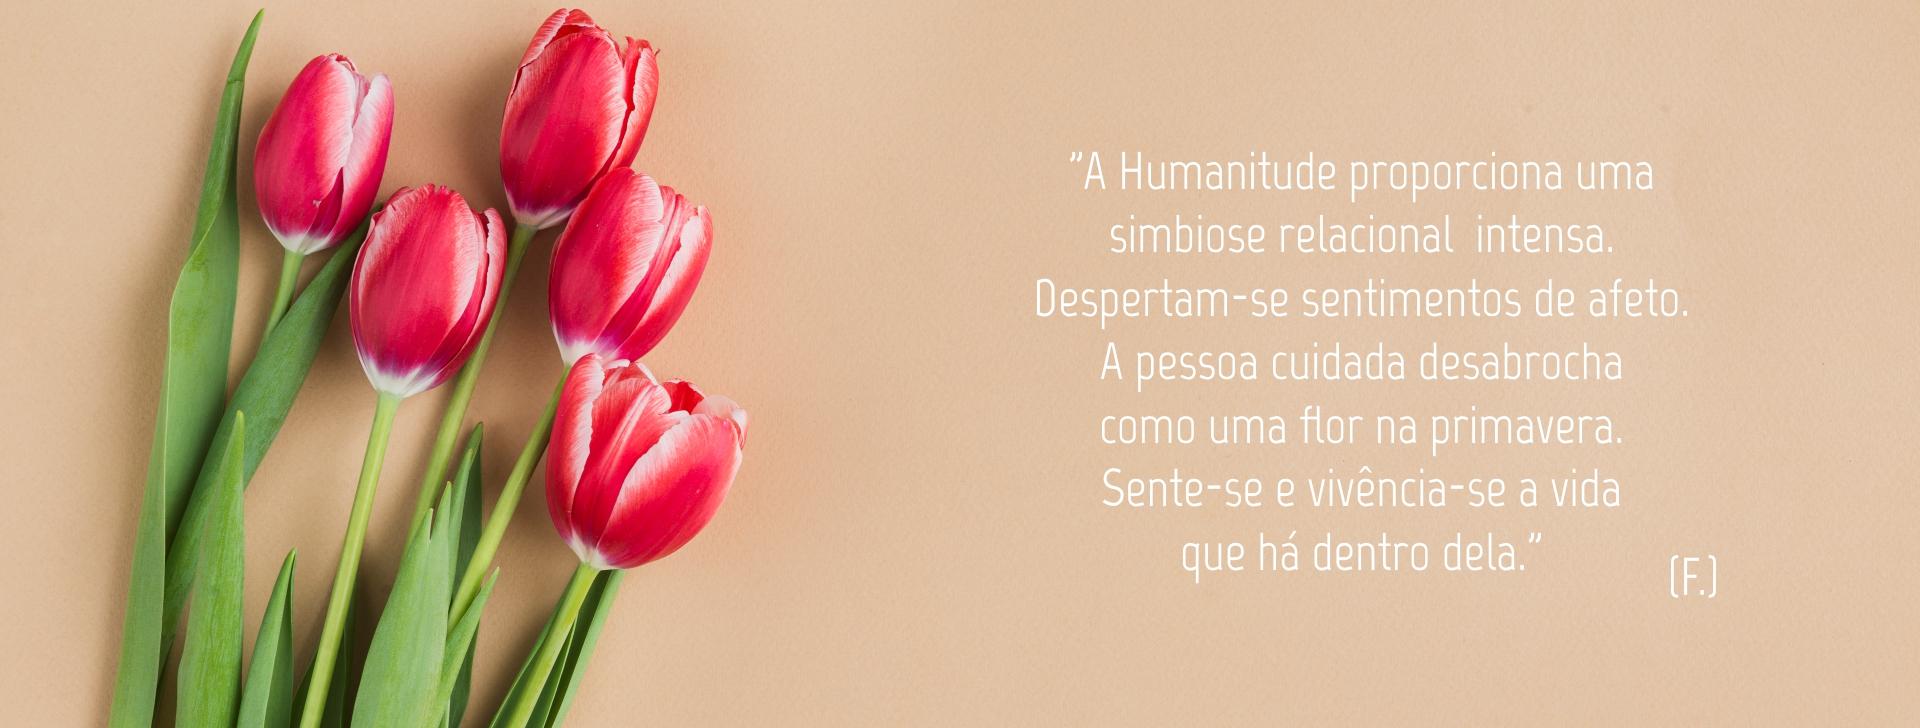 banner humanitude